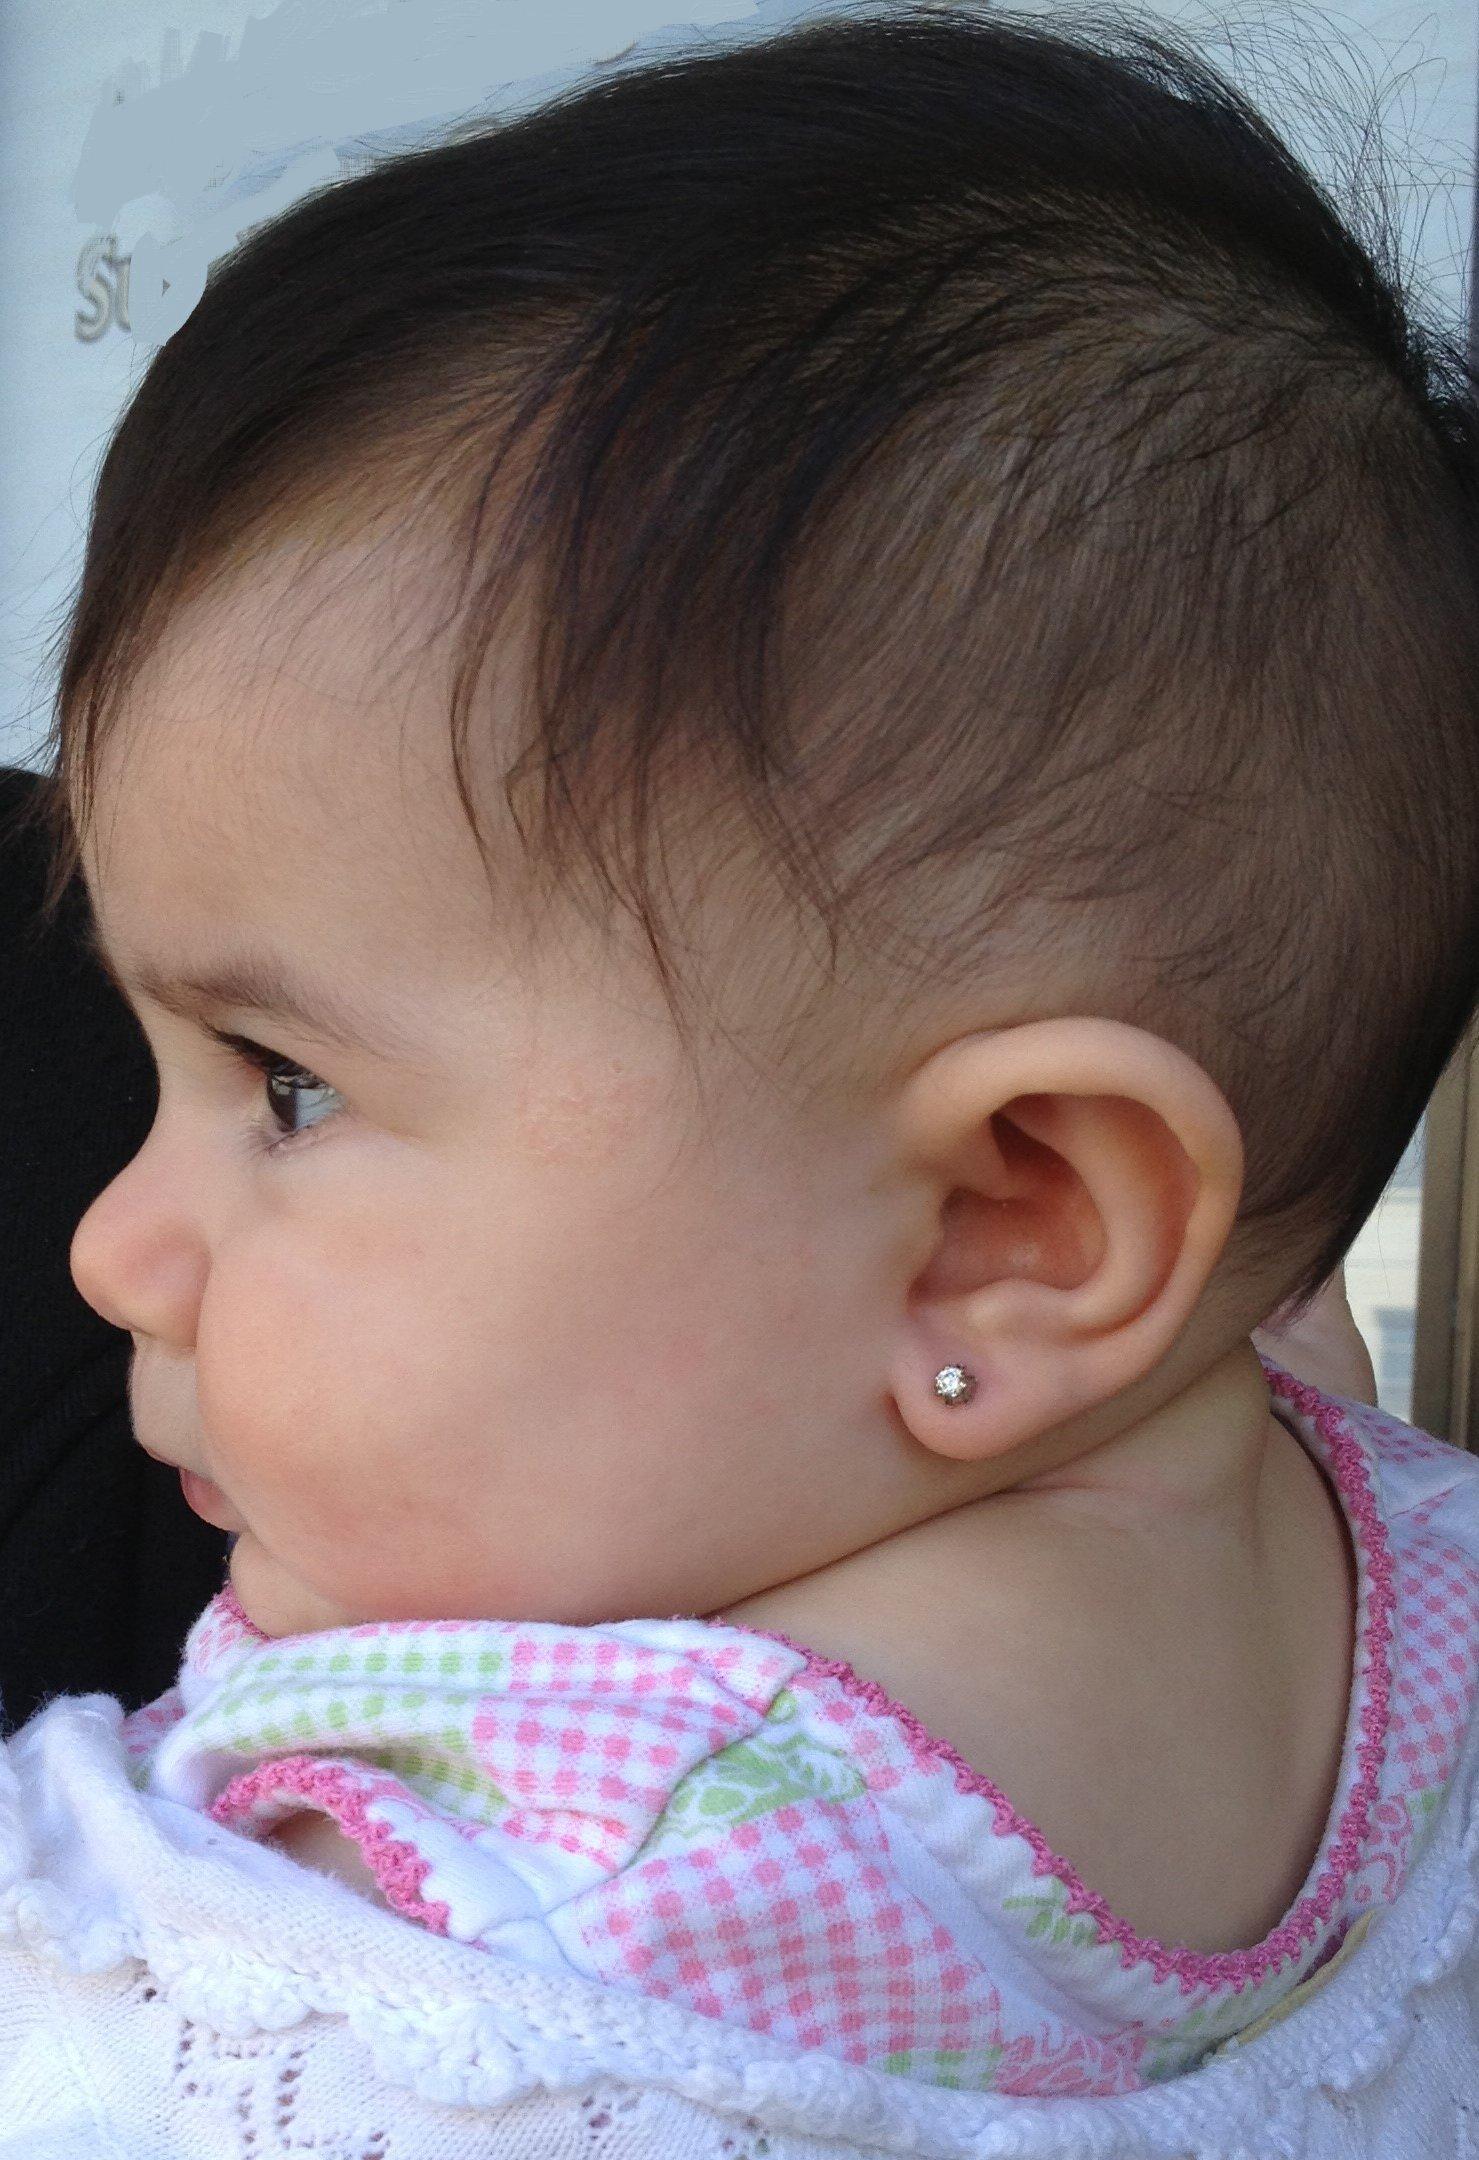 Specializing In Piercing Infants Thru S No Body